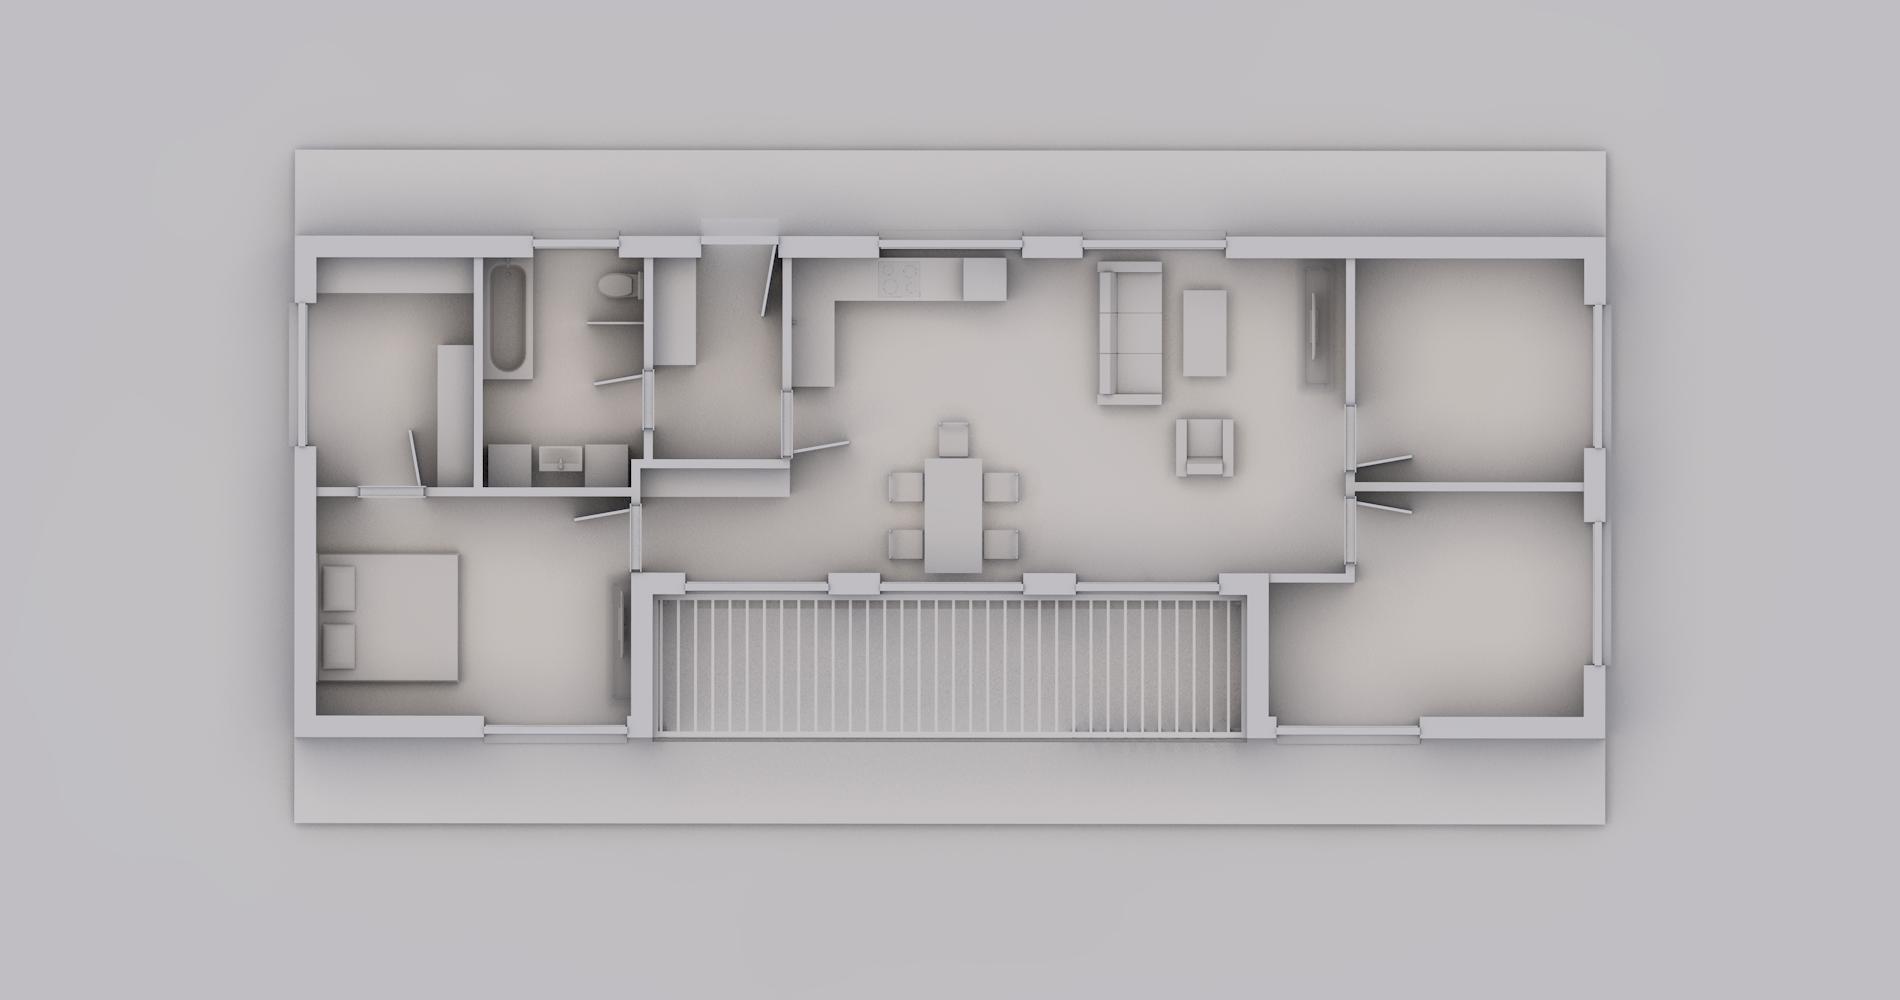 Rodinný dům U111 4+kk 7